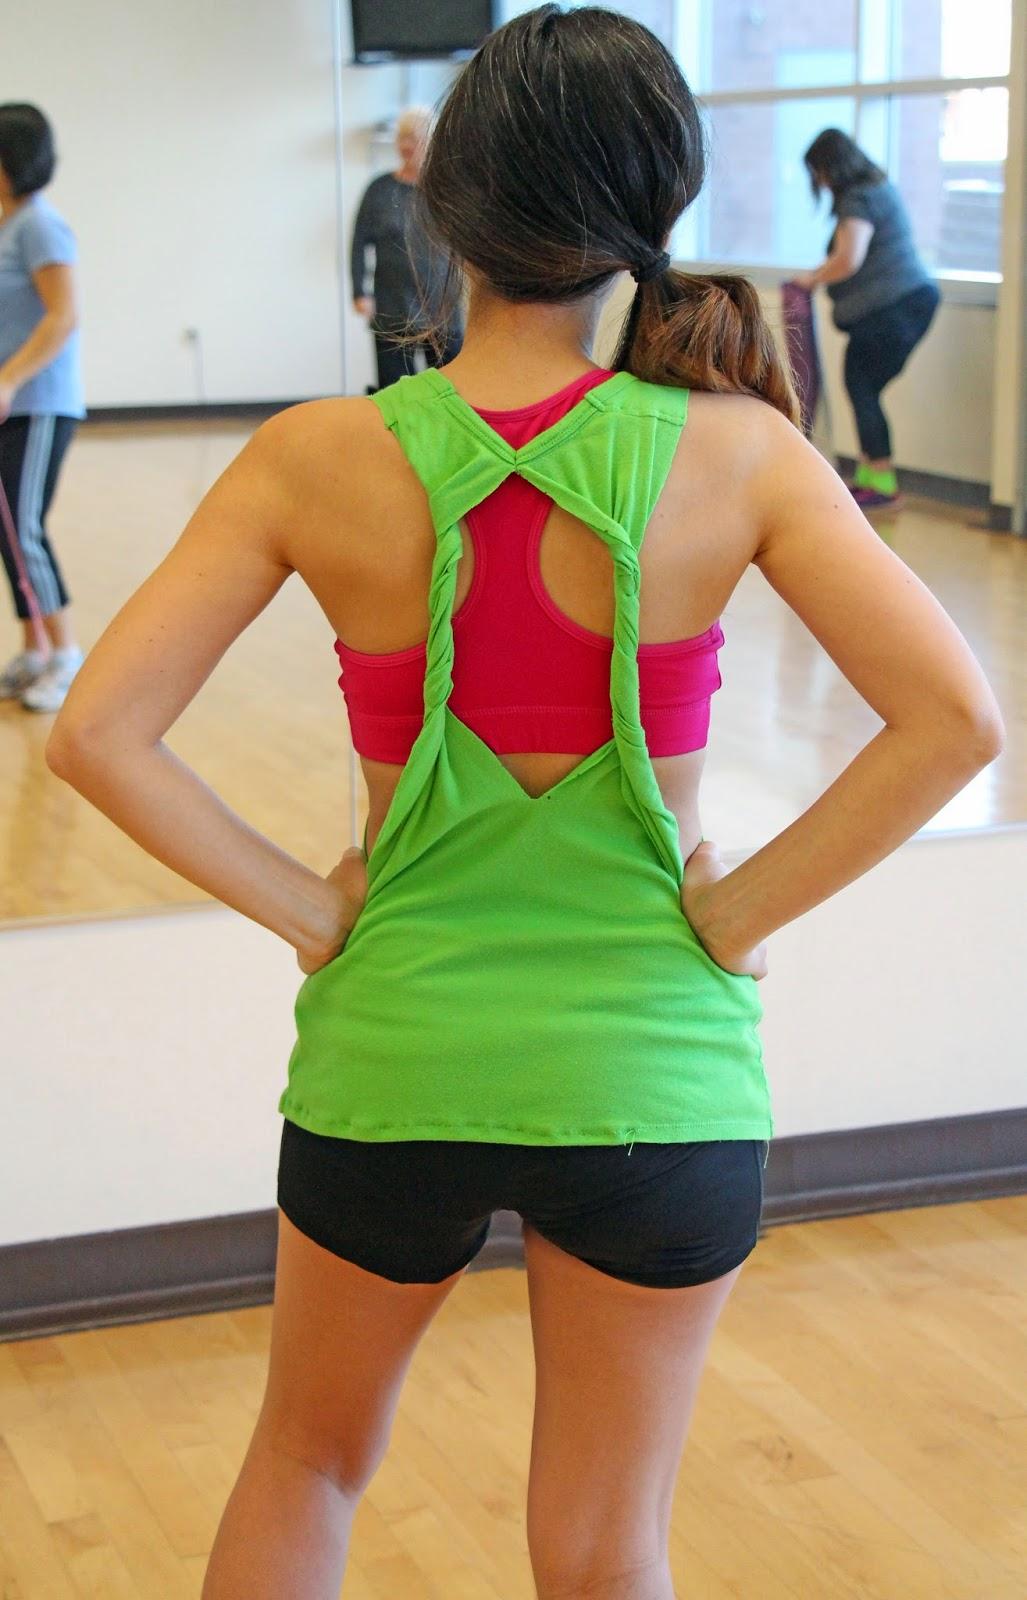 Grosgrain: 30 Days of DIY Workout Wear: Day 1